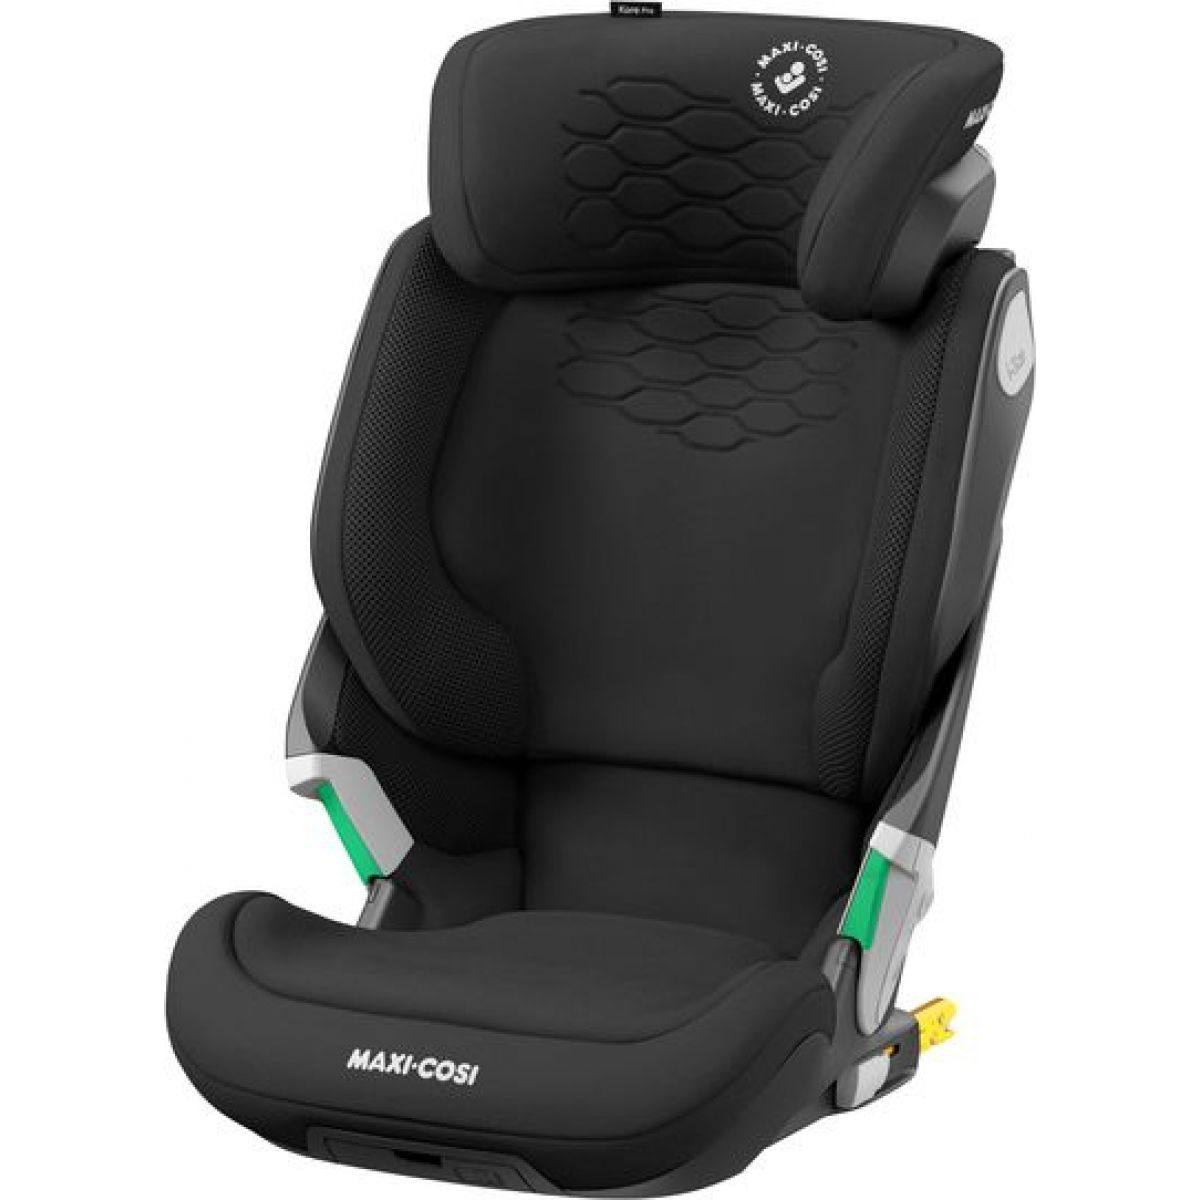 Maxi Cosi Kore Pro i-Size autosedačka Authentic Black